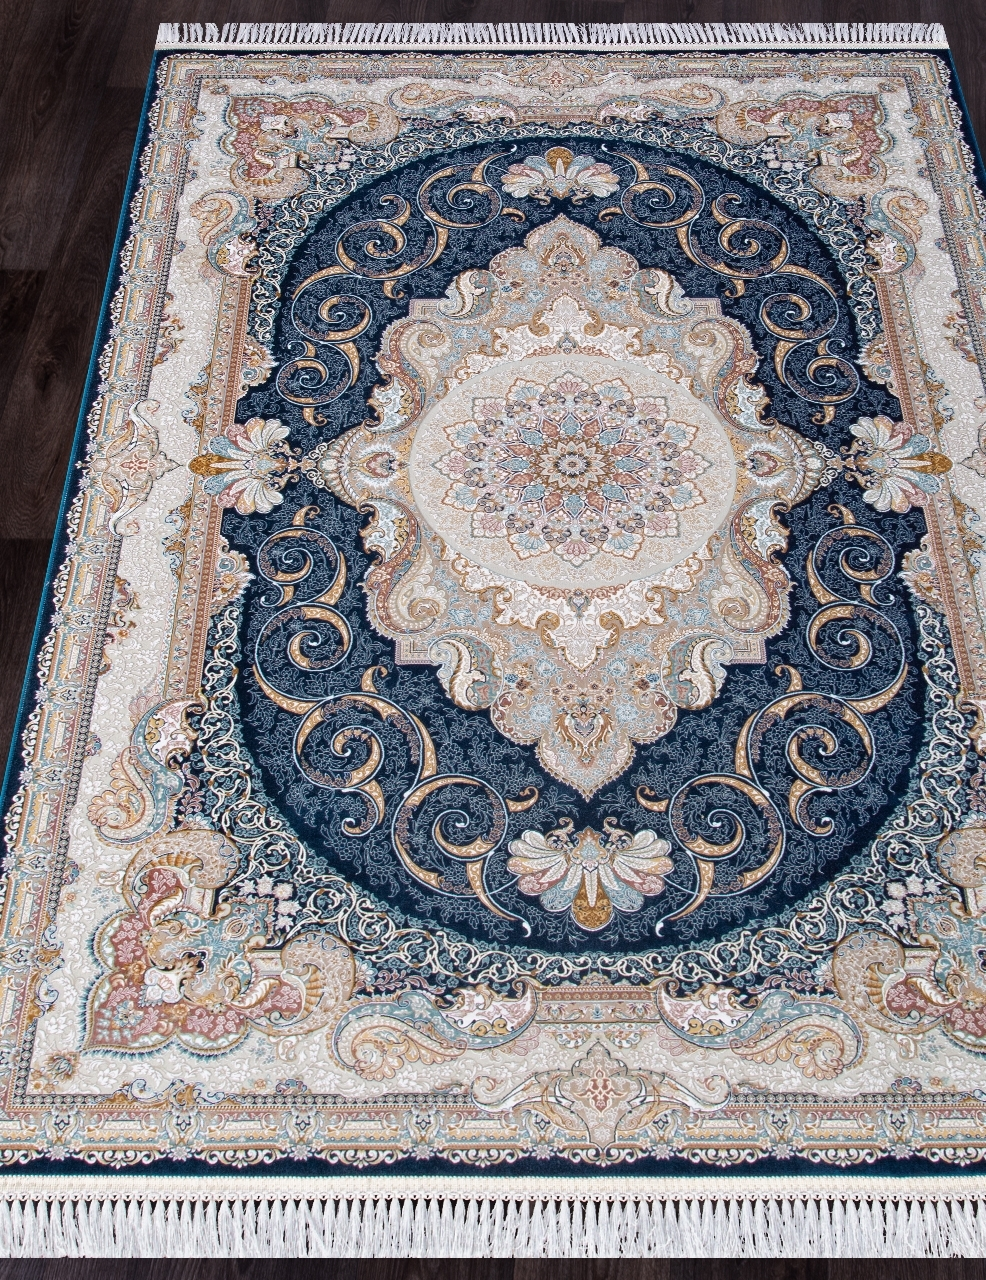 Ковер 144 - DARK BLUE - Прямоугольник - коллекция FARSI 1500